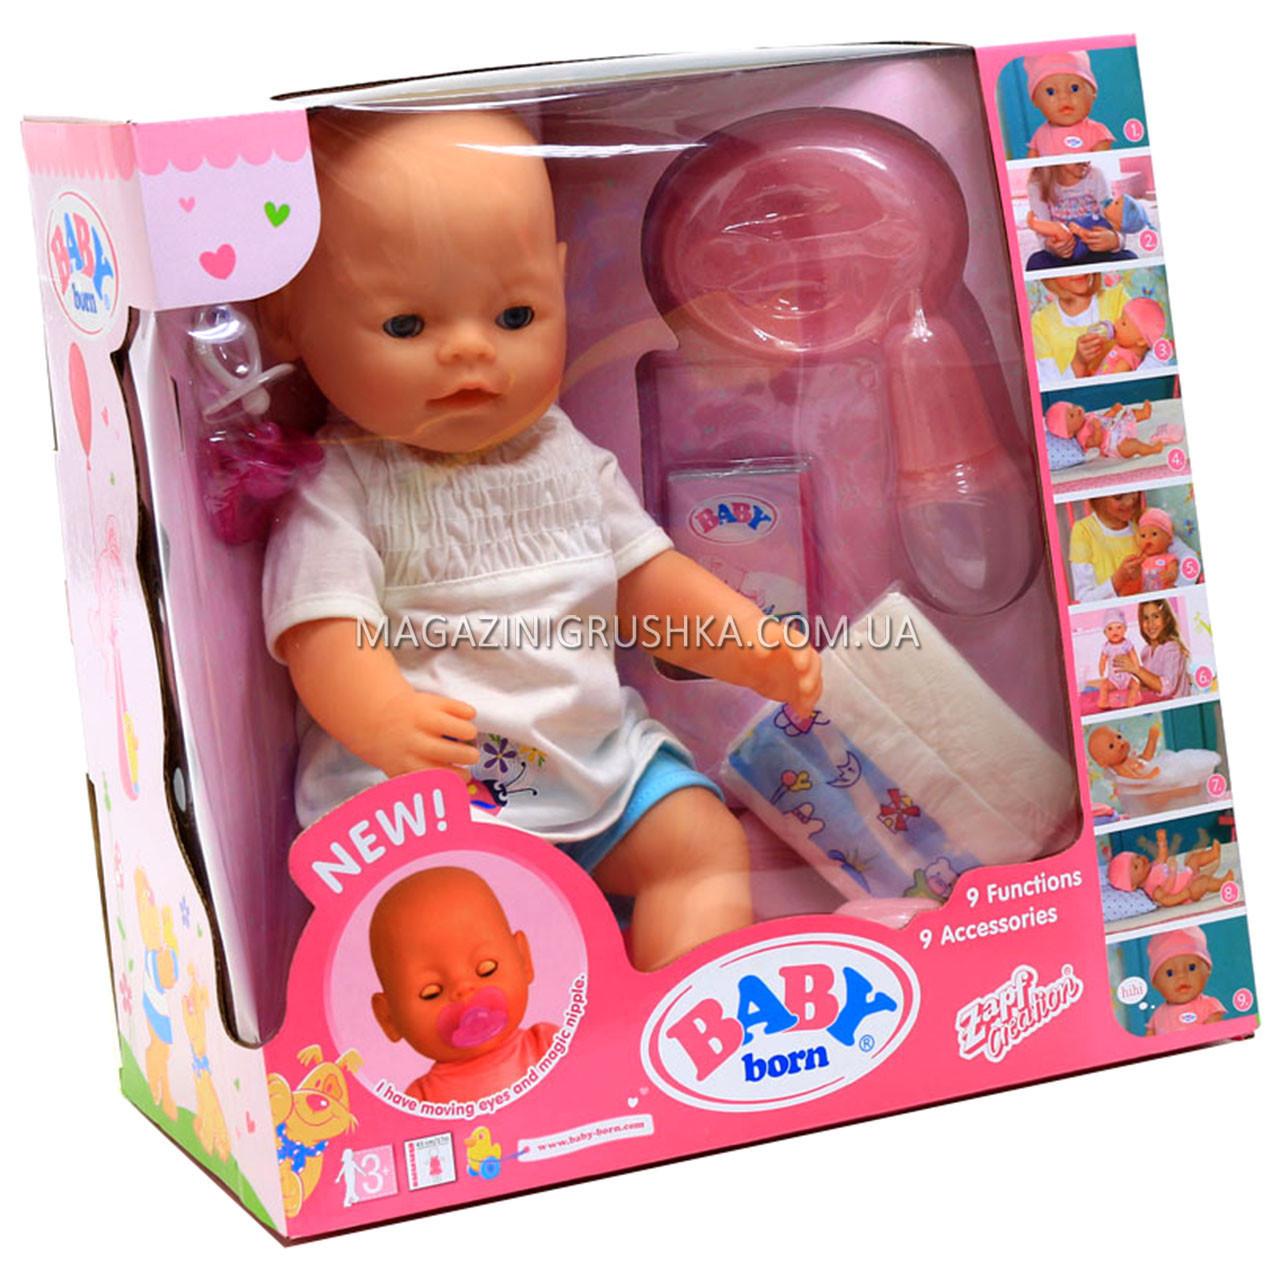 Интерактивная кукла Baby Born (беби бон). Пупс аналог с одеждой и аксессуарами 9 функций беби борн BB 8009-440